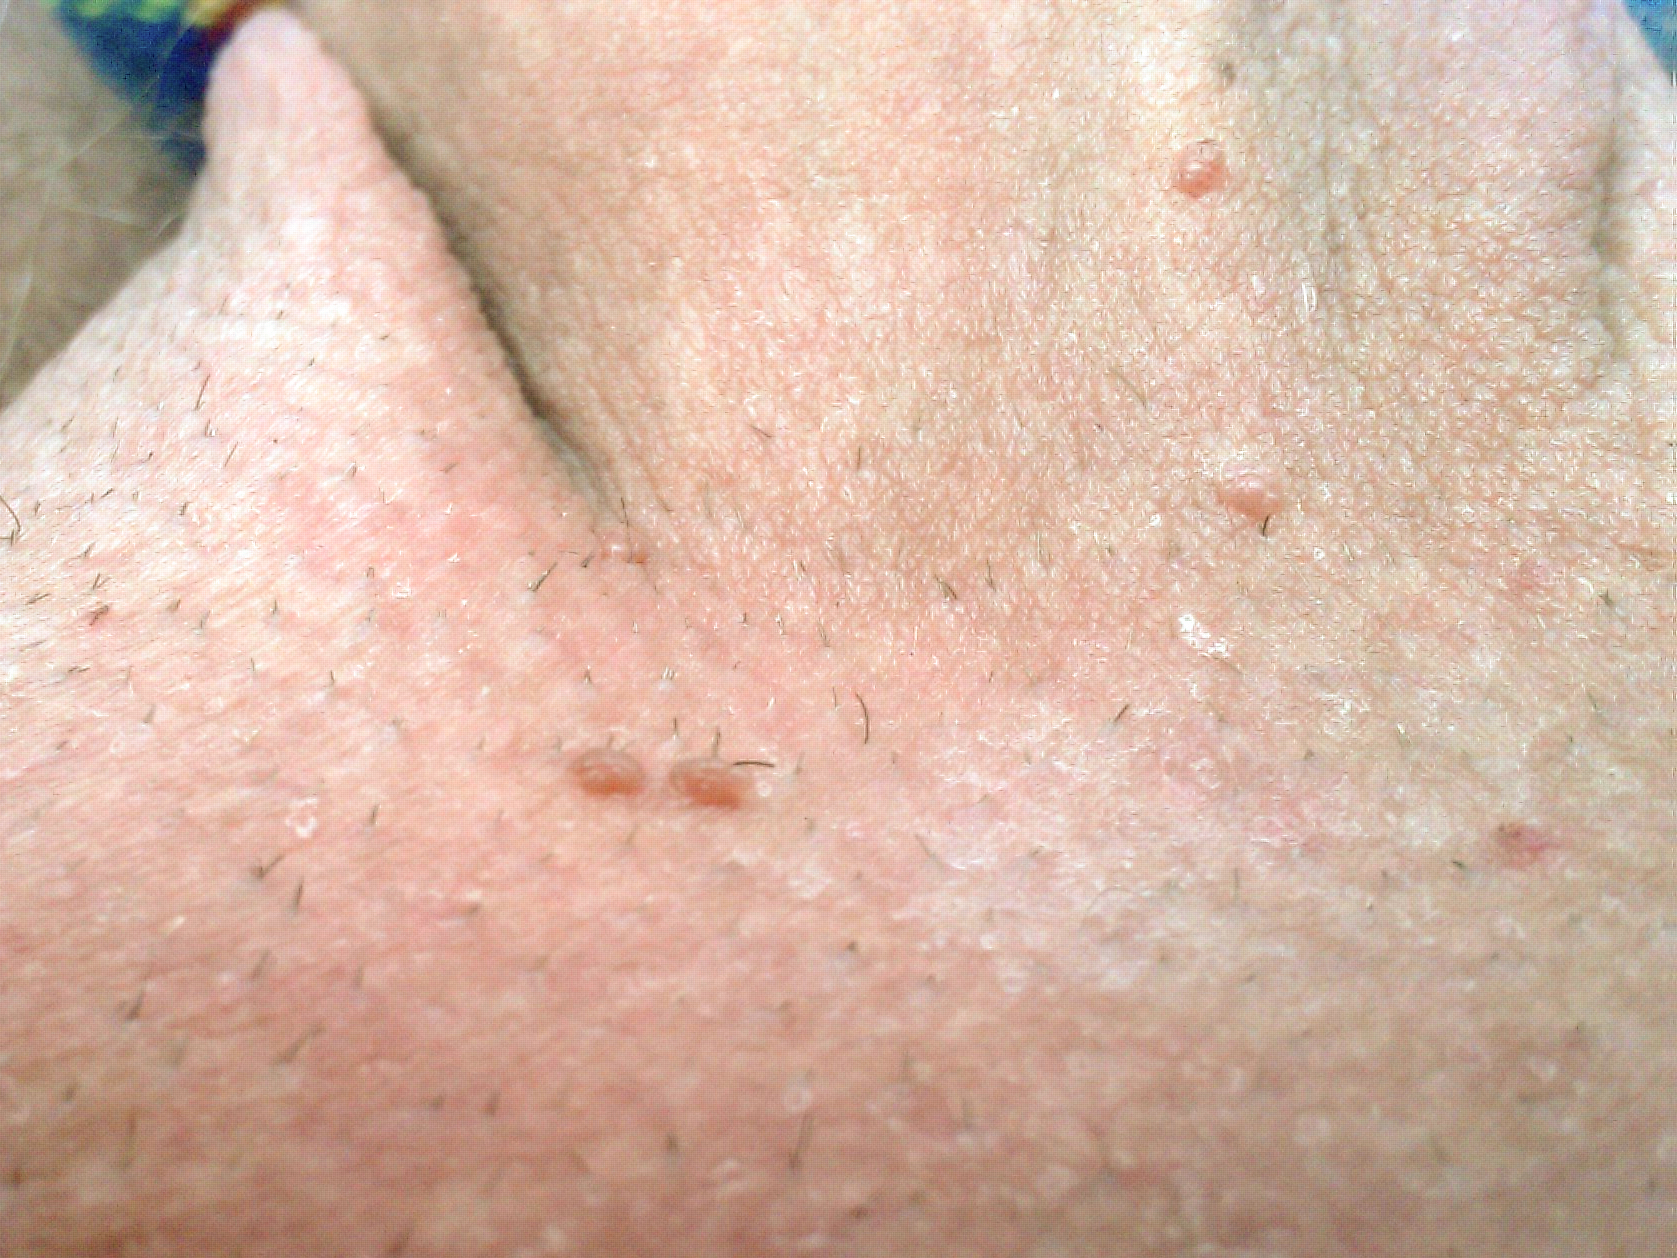 human papillomavirus 9 valent vaccine cpt does the human papillomavirus vaccine hurt